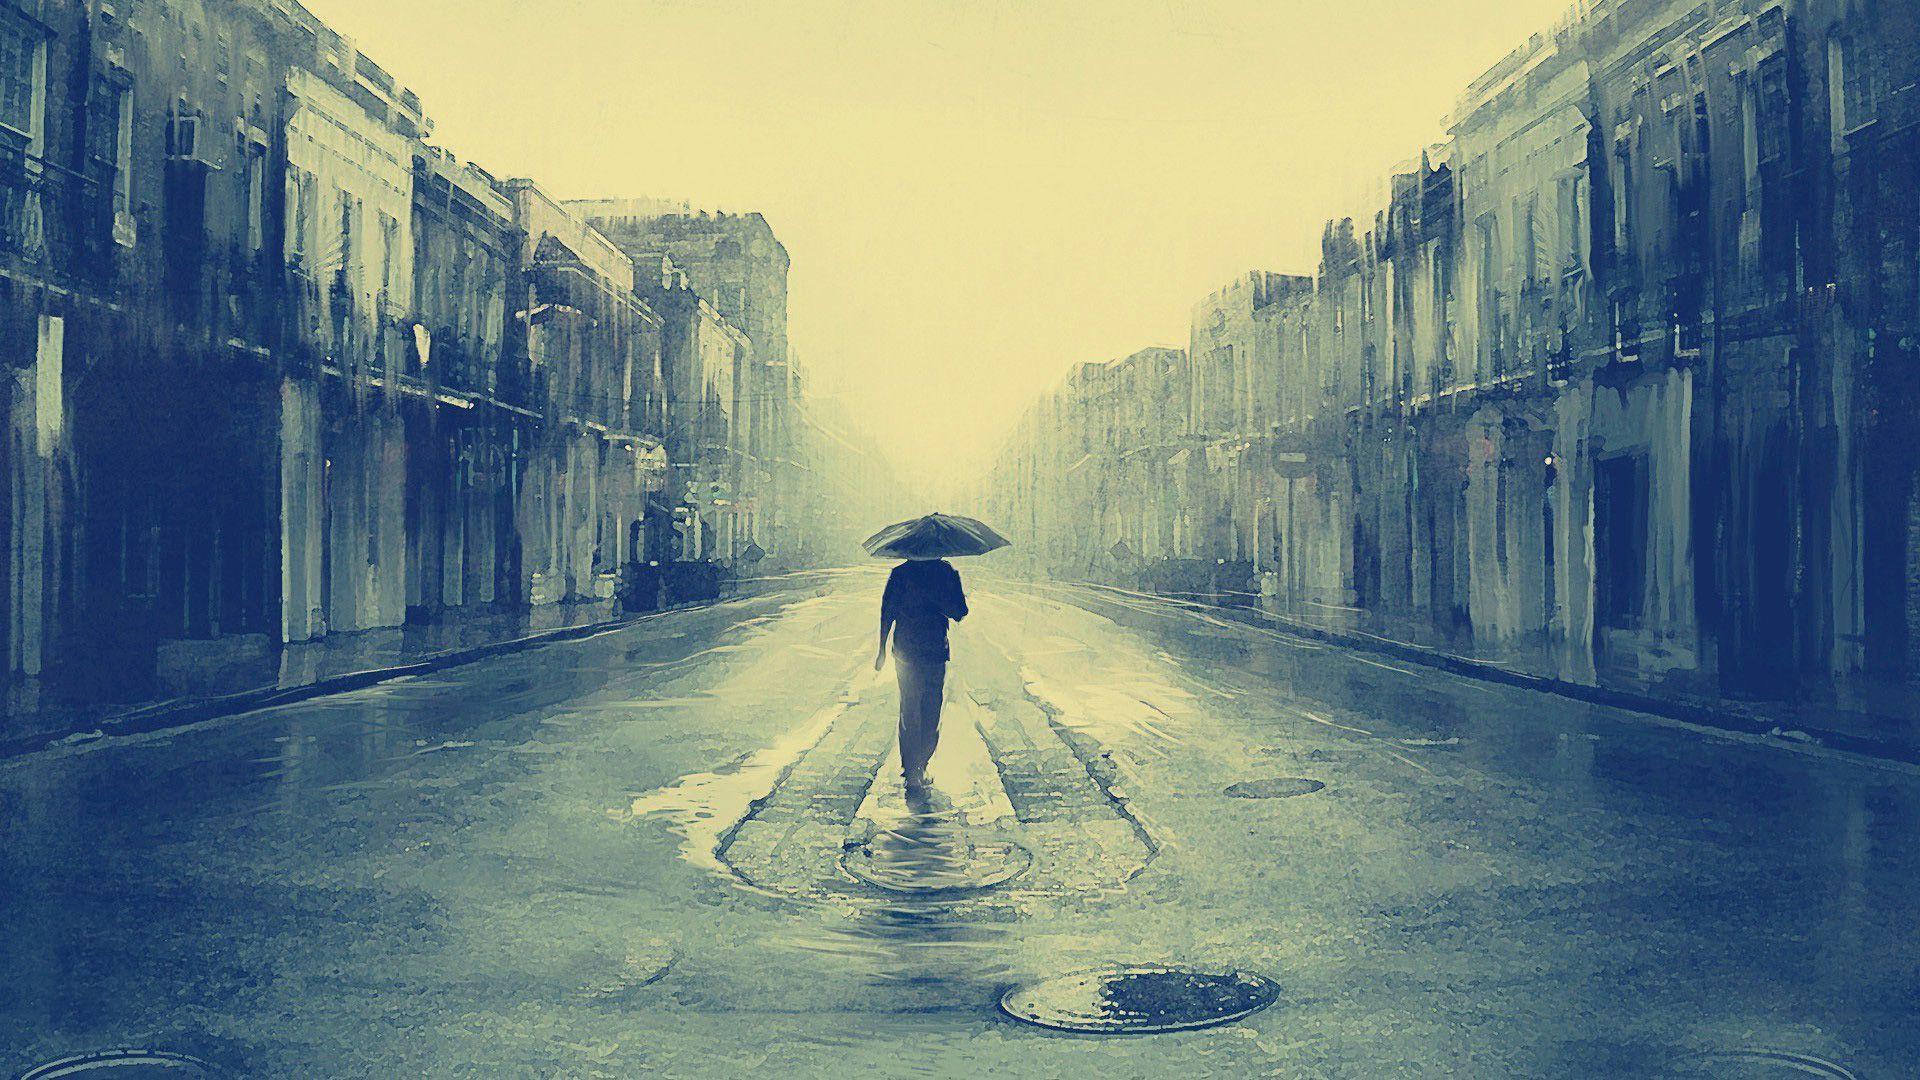 walking-through-the-rainy-city-artistic-hd-wallpaper-1920x1080-1312.jpg